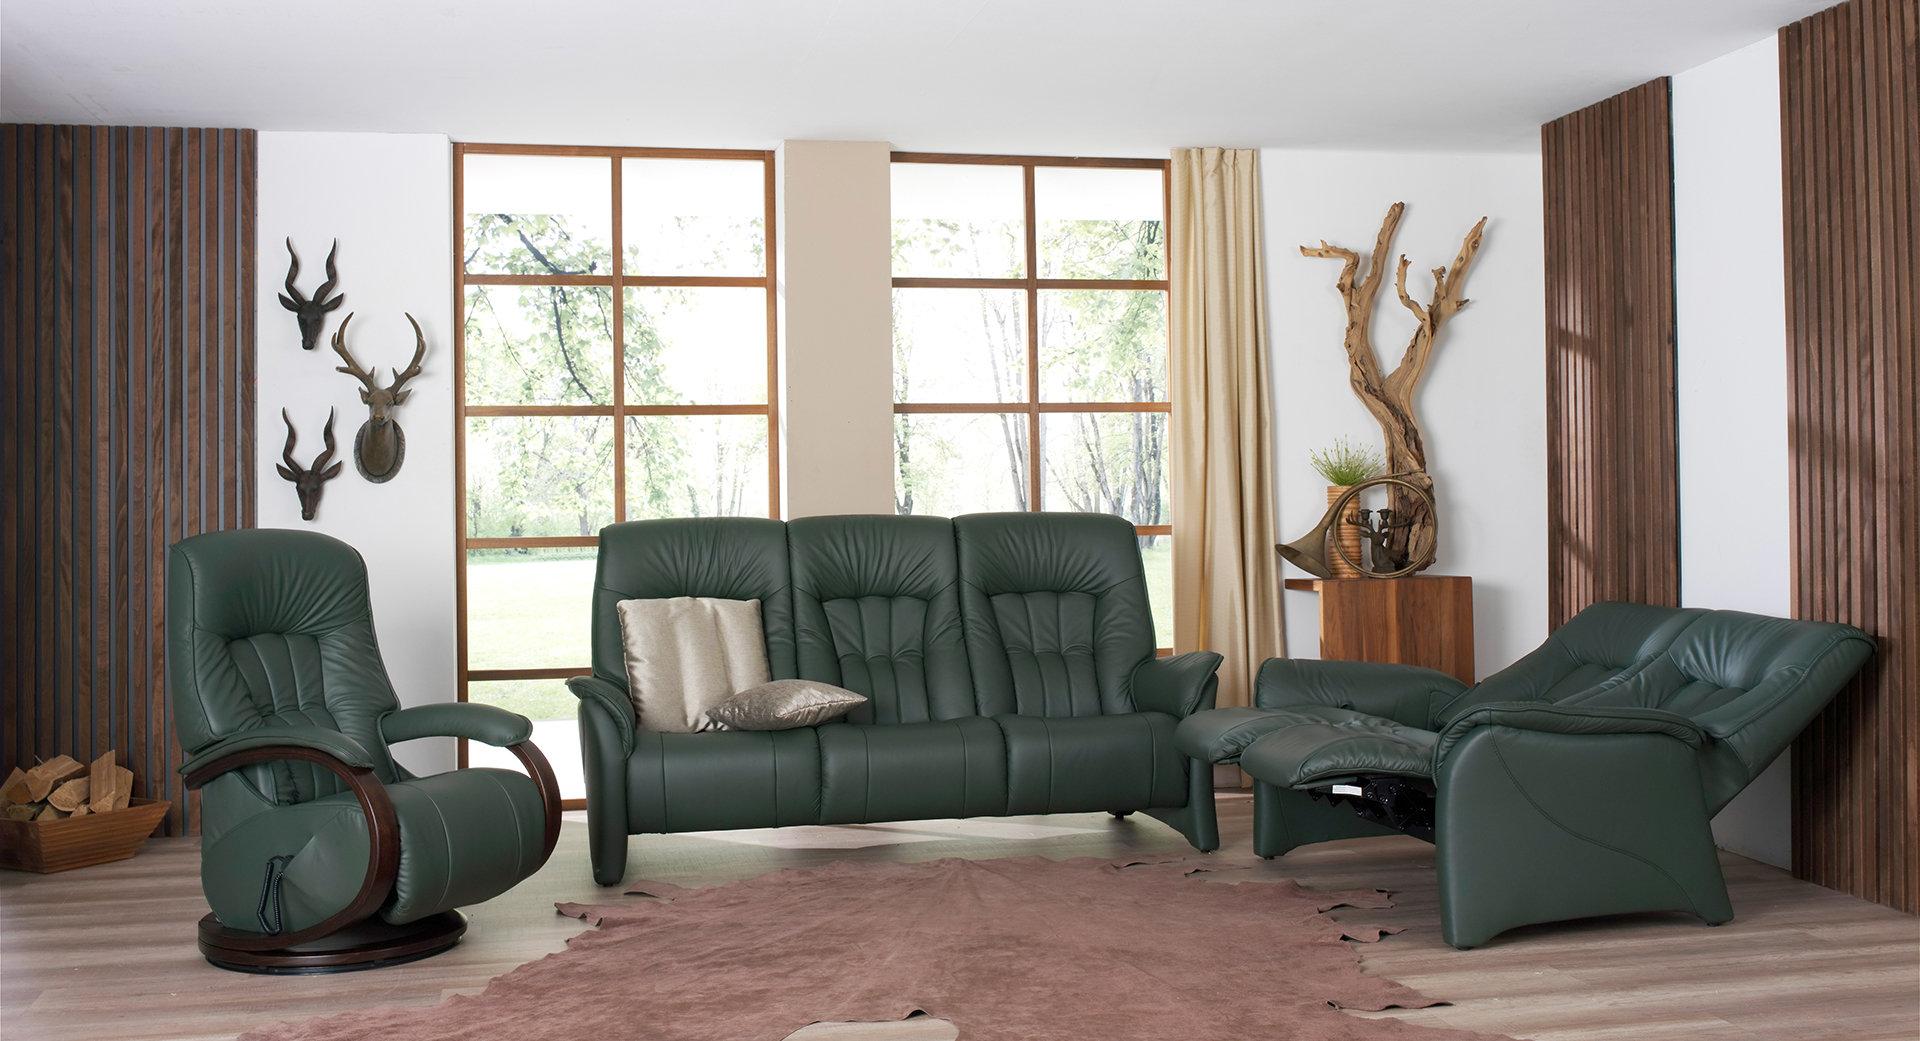 sofas de piel verde